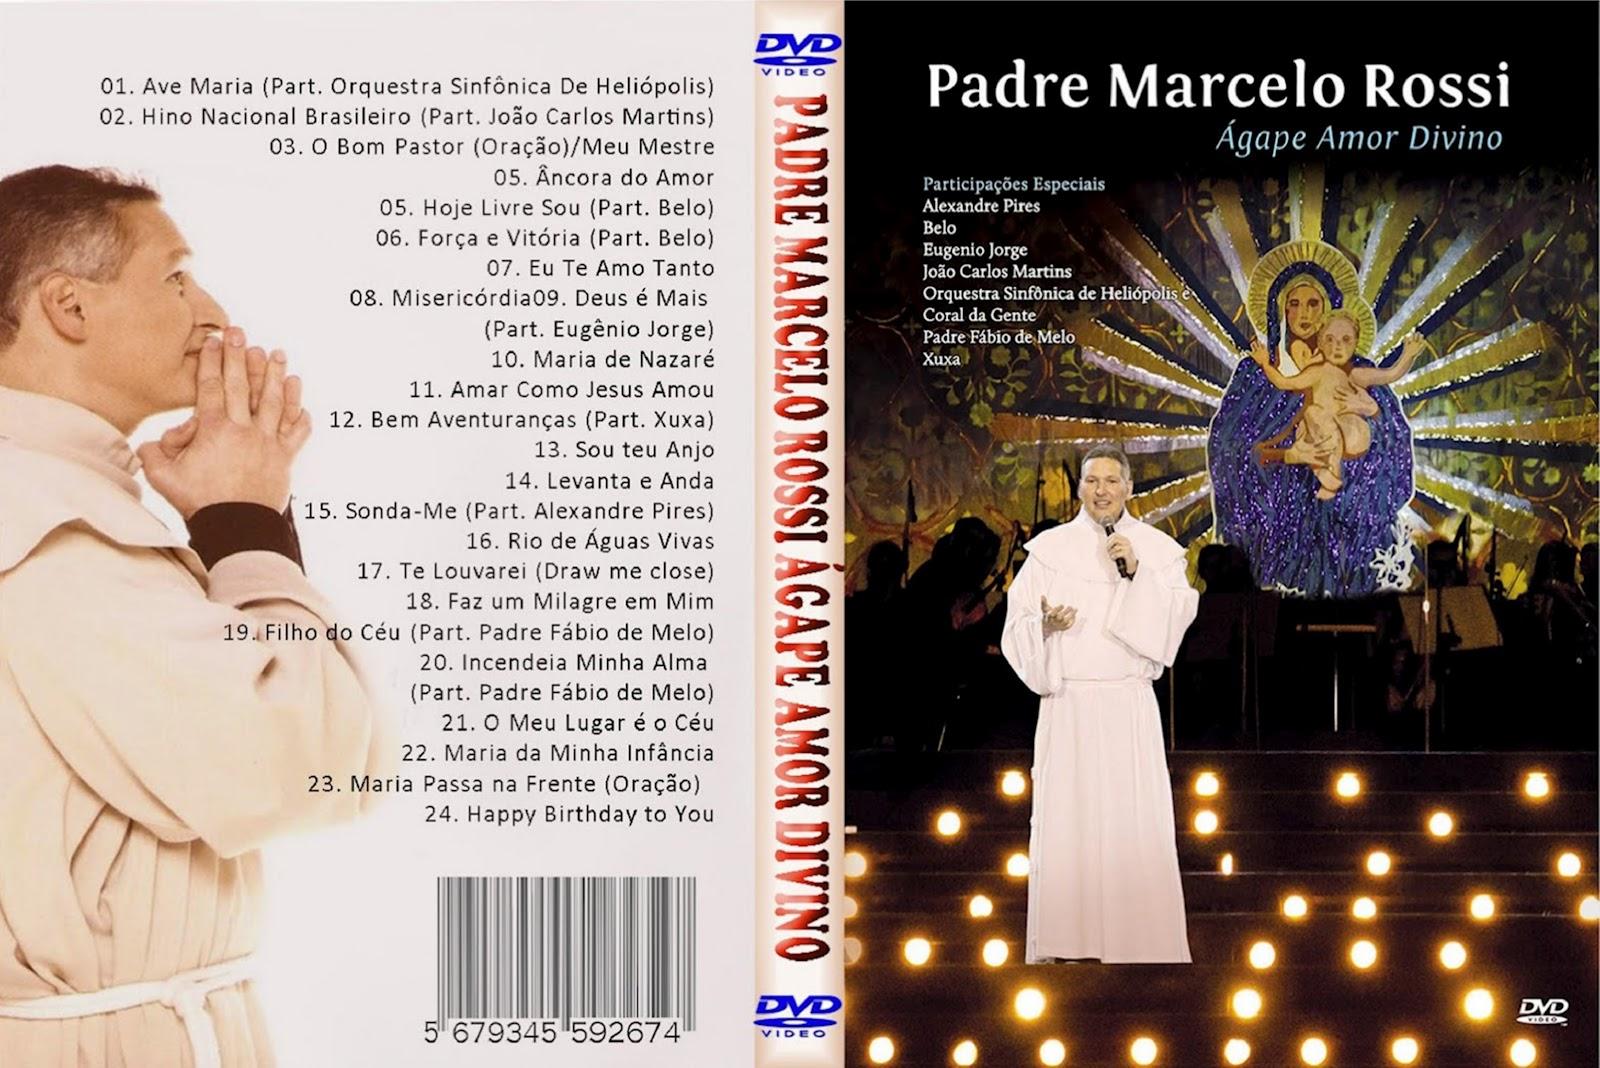 2012 DVD ROSSI BAIXAR GRATIS MARCELO PADRE